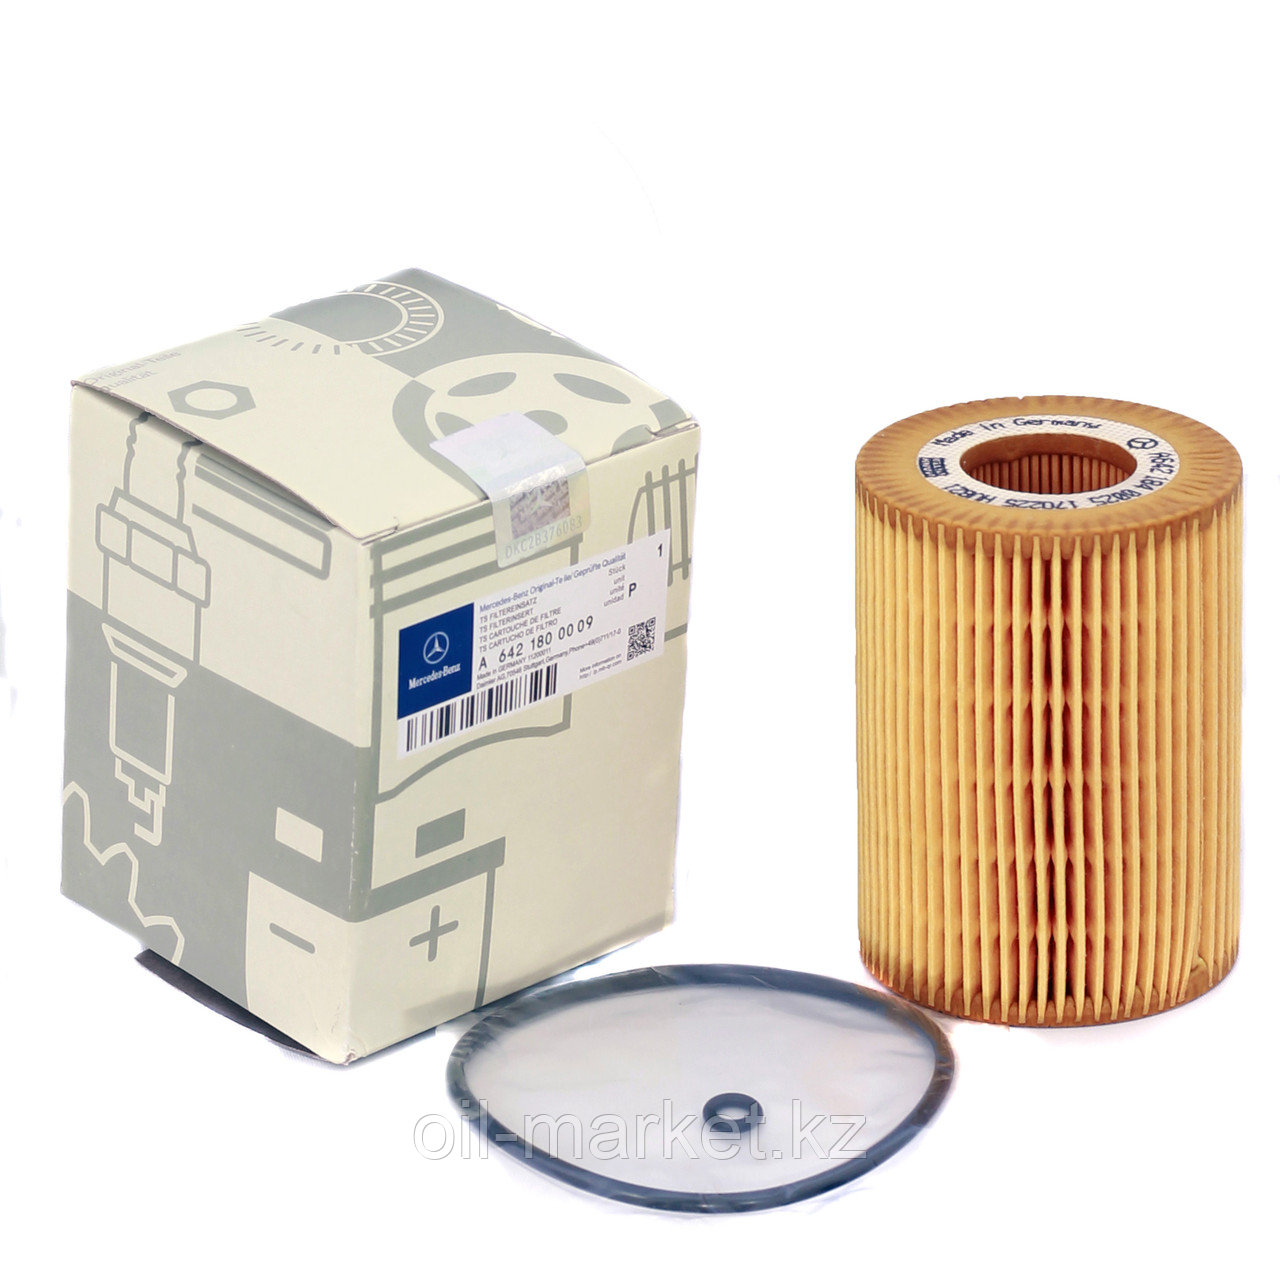 Масляный фильтр MB W251/S211/Viano/Sprinter 3.0CDi 05>